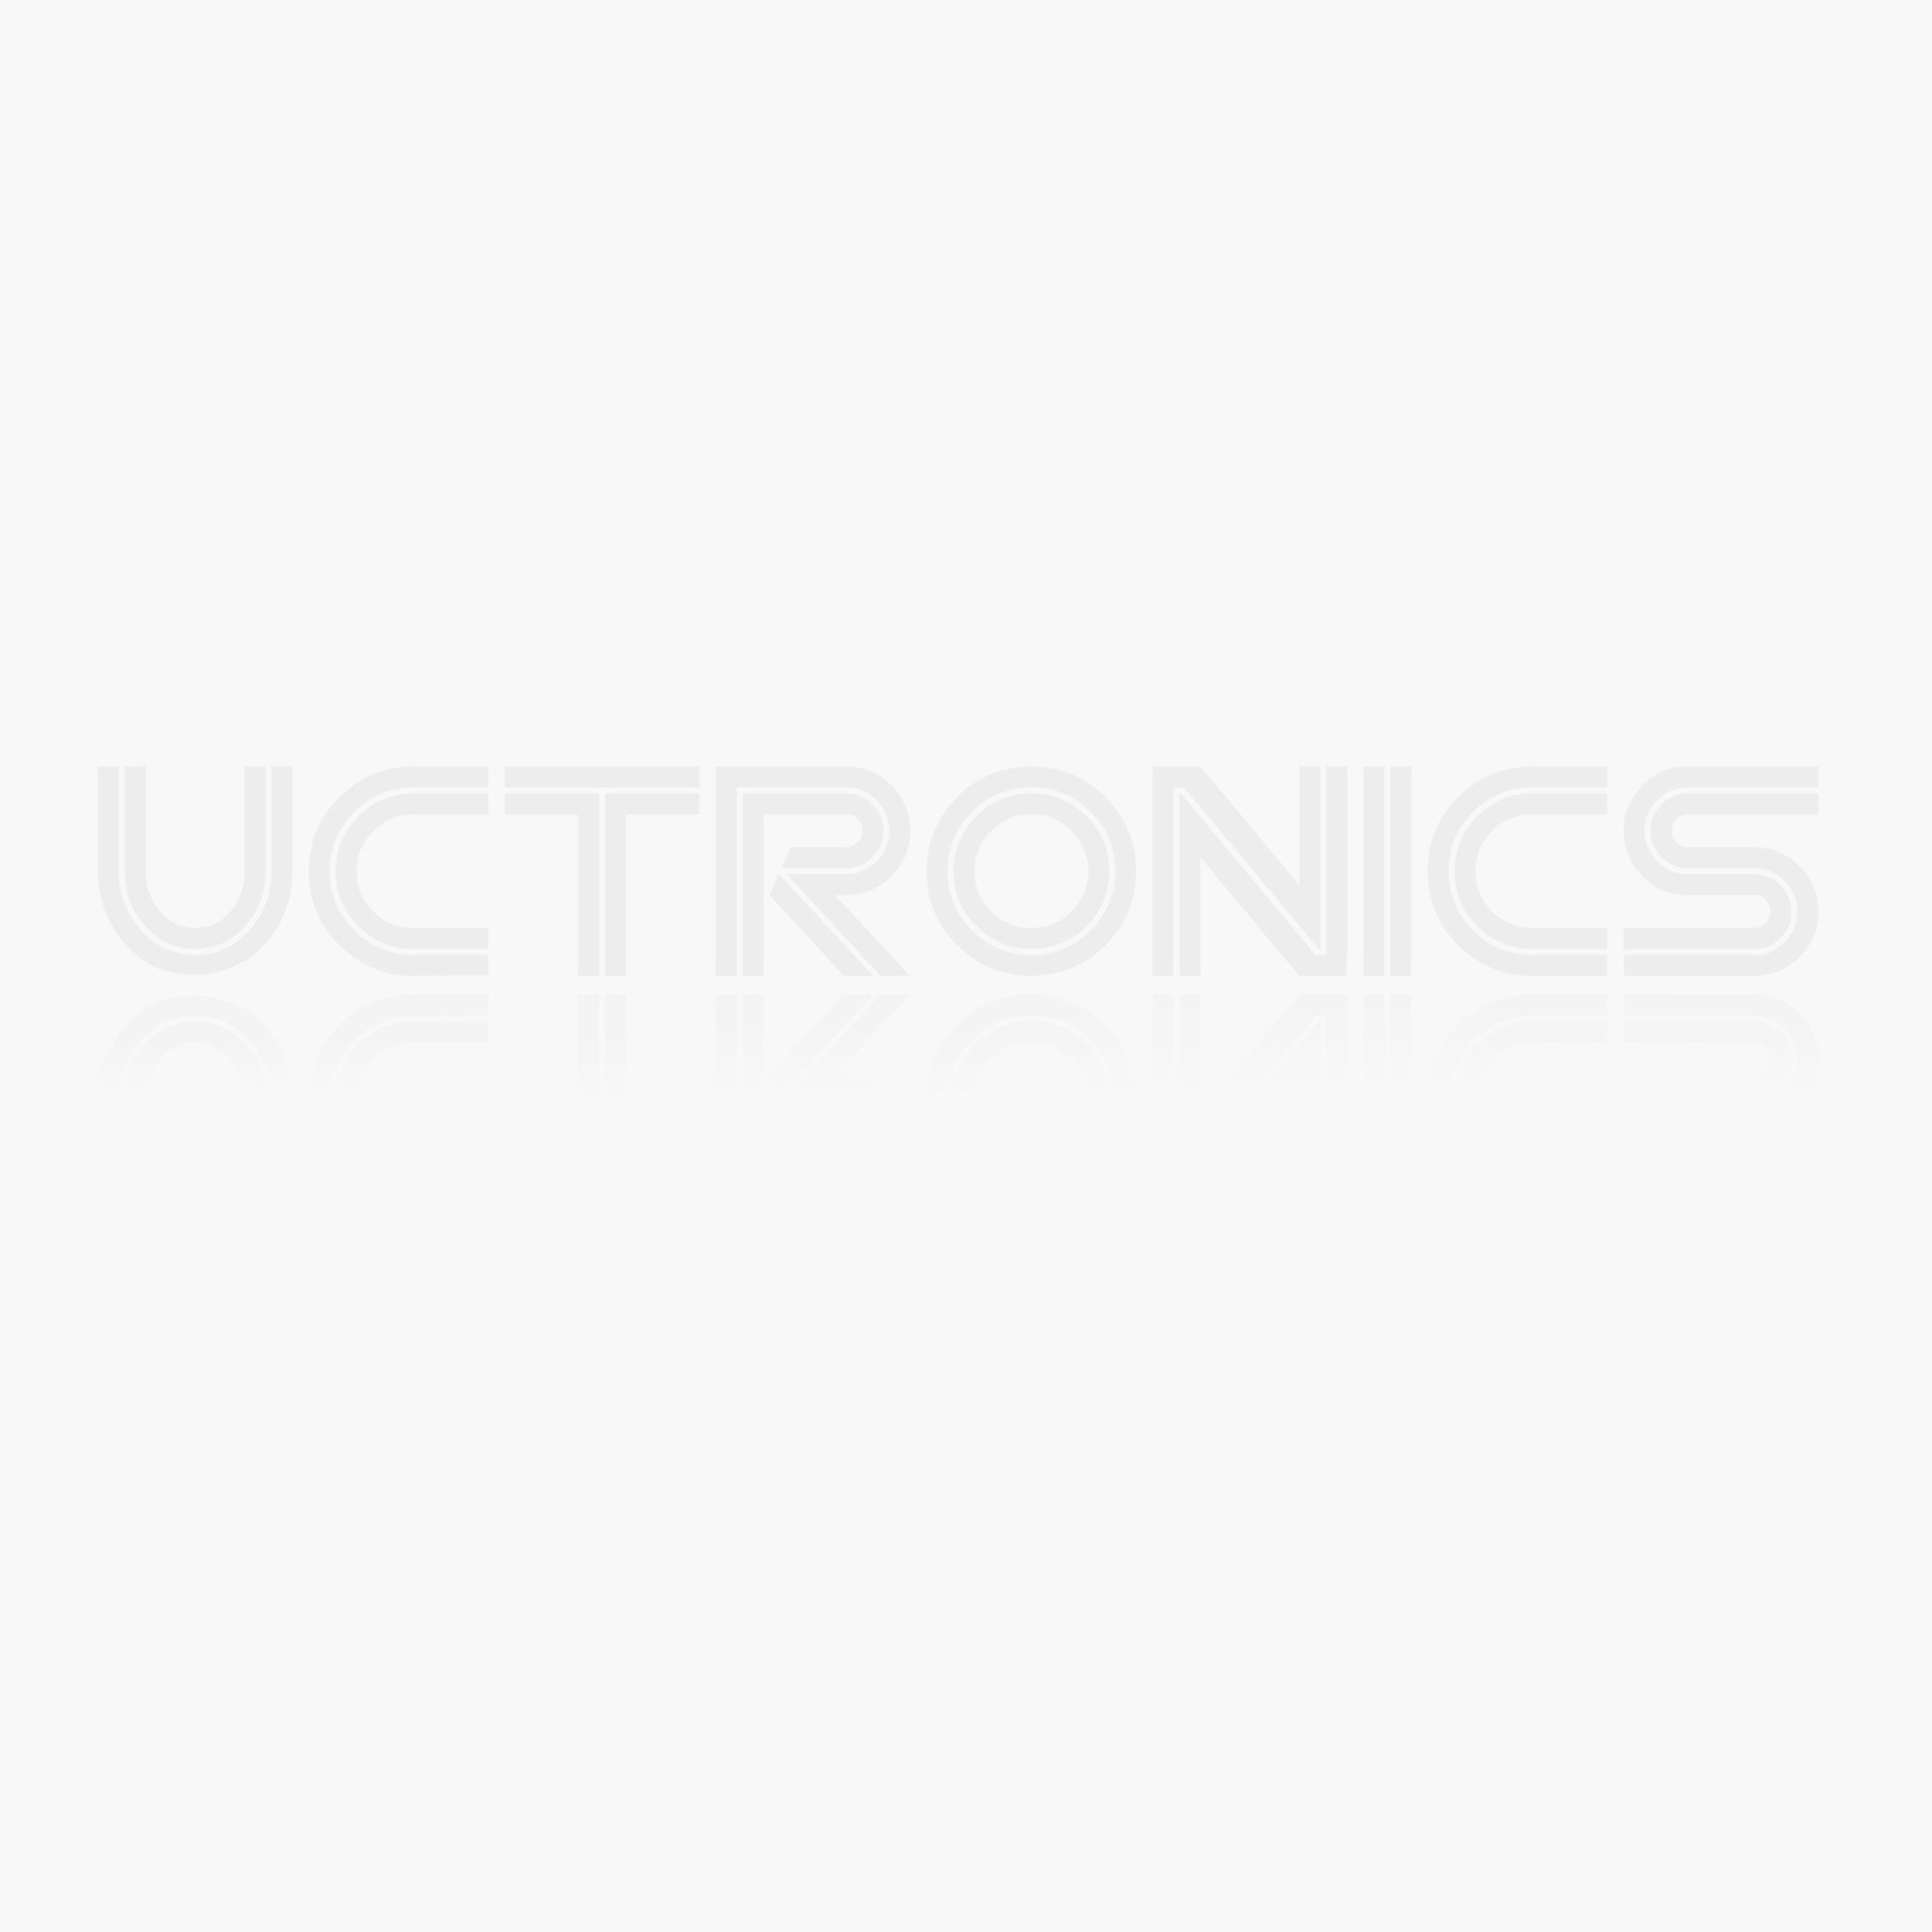 DC 5V 12V 24V Photoresistor Module Light Detector Automatic Control Relay Switch